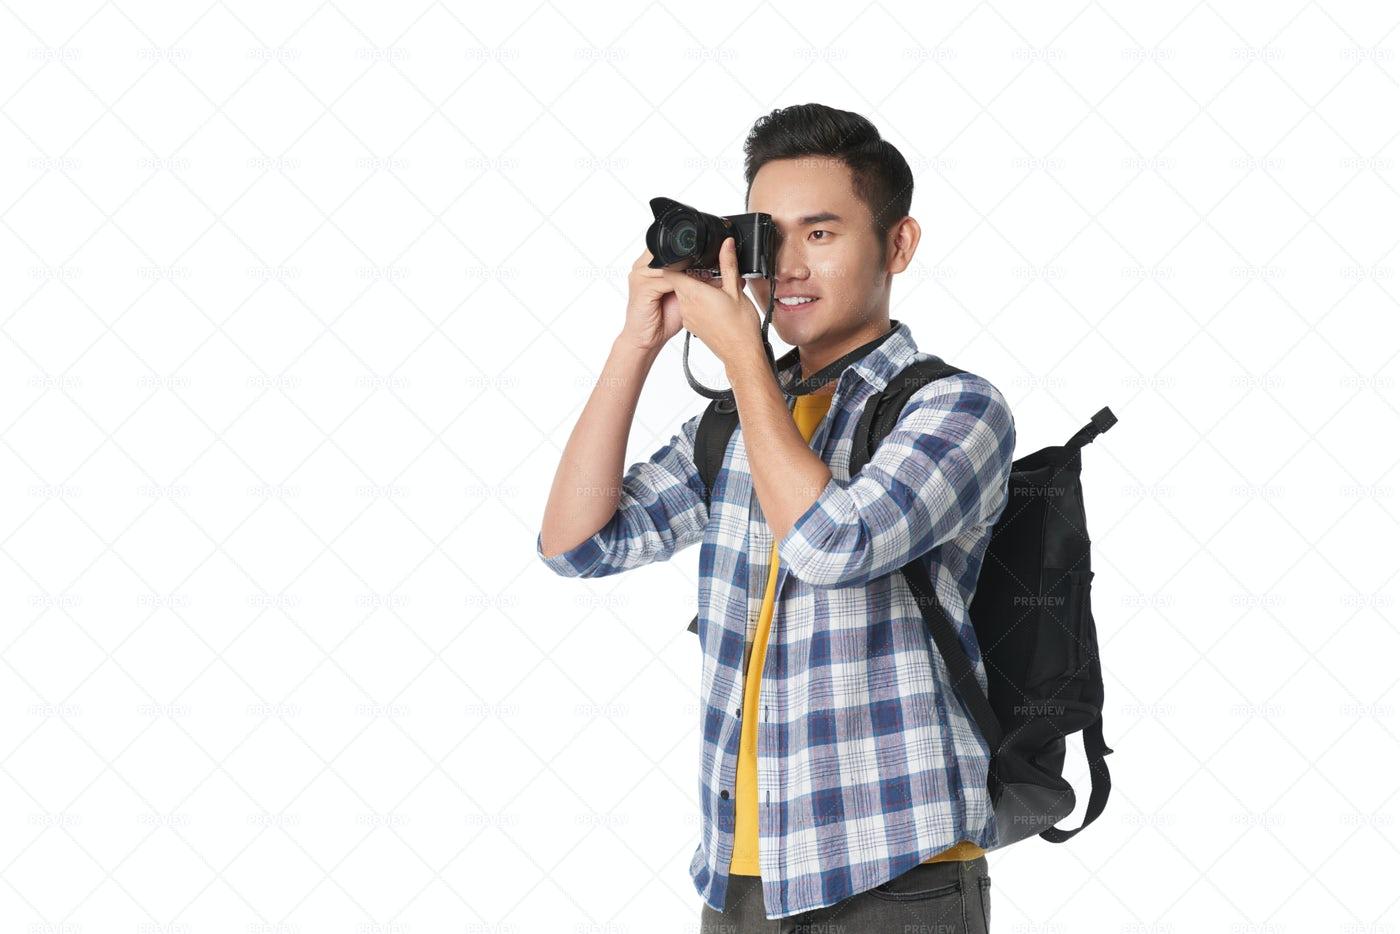 Smiling Tourist With Camera: Stock Photos